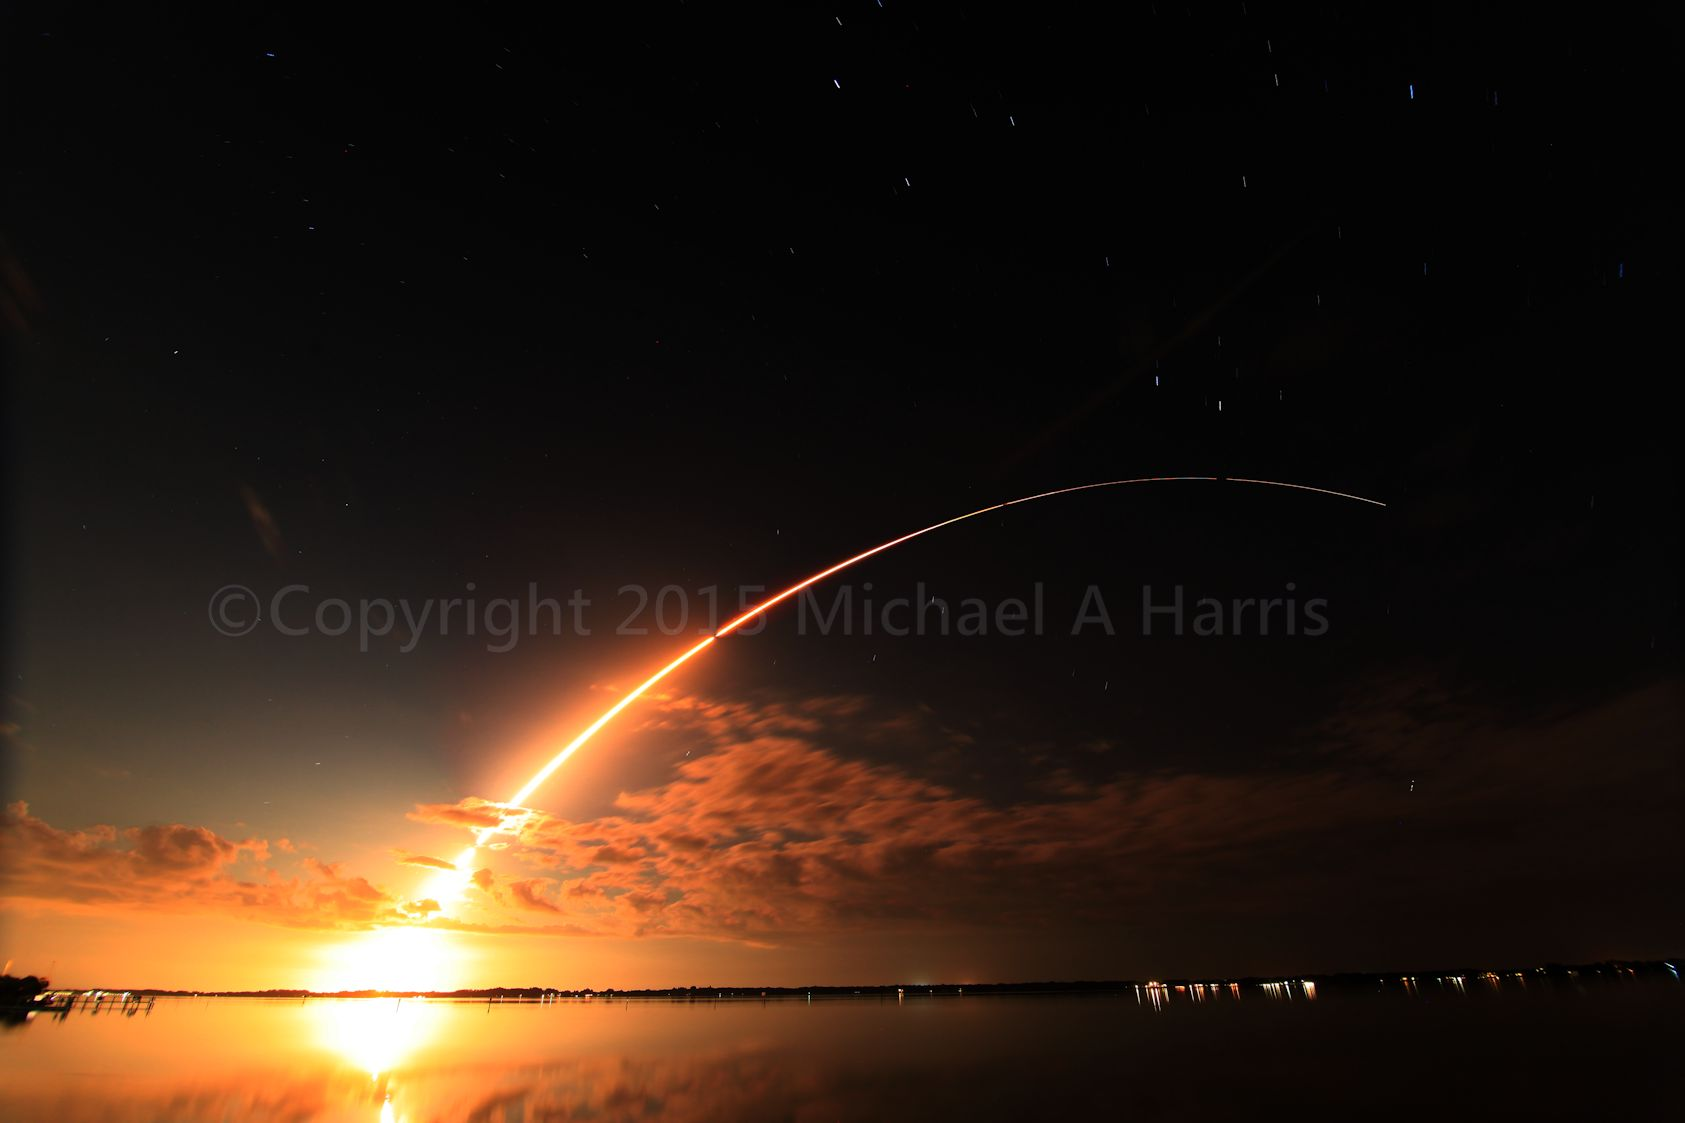 Atlas V Launch - United States Navy Mobile User Objective System Satellite